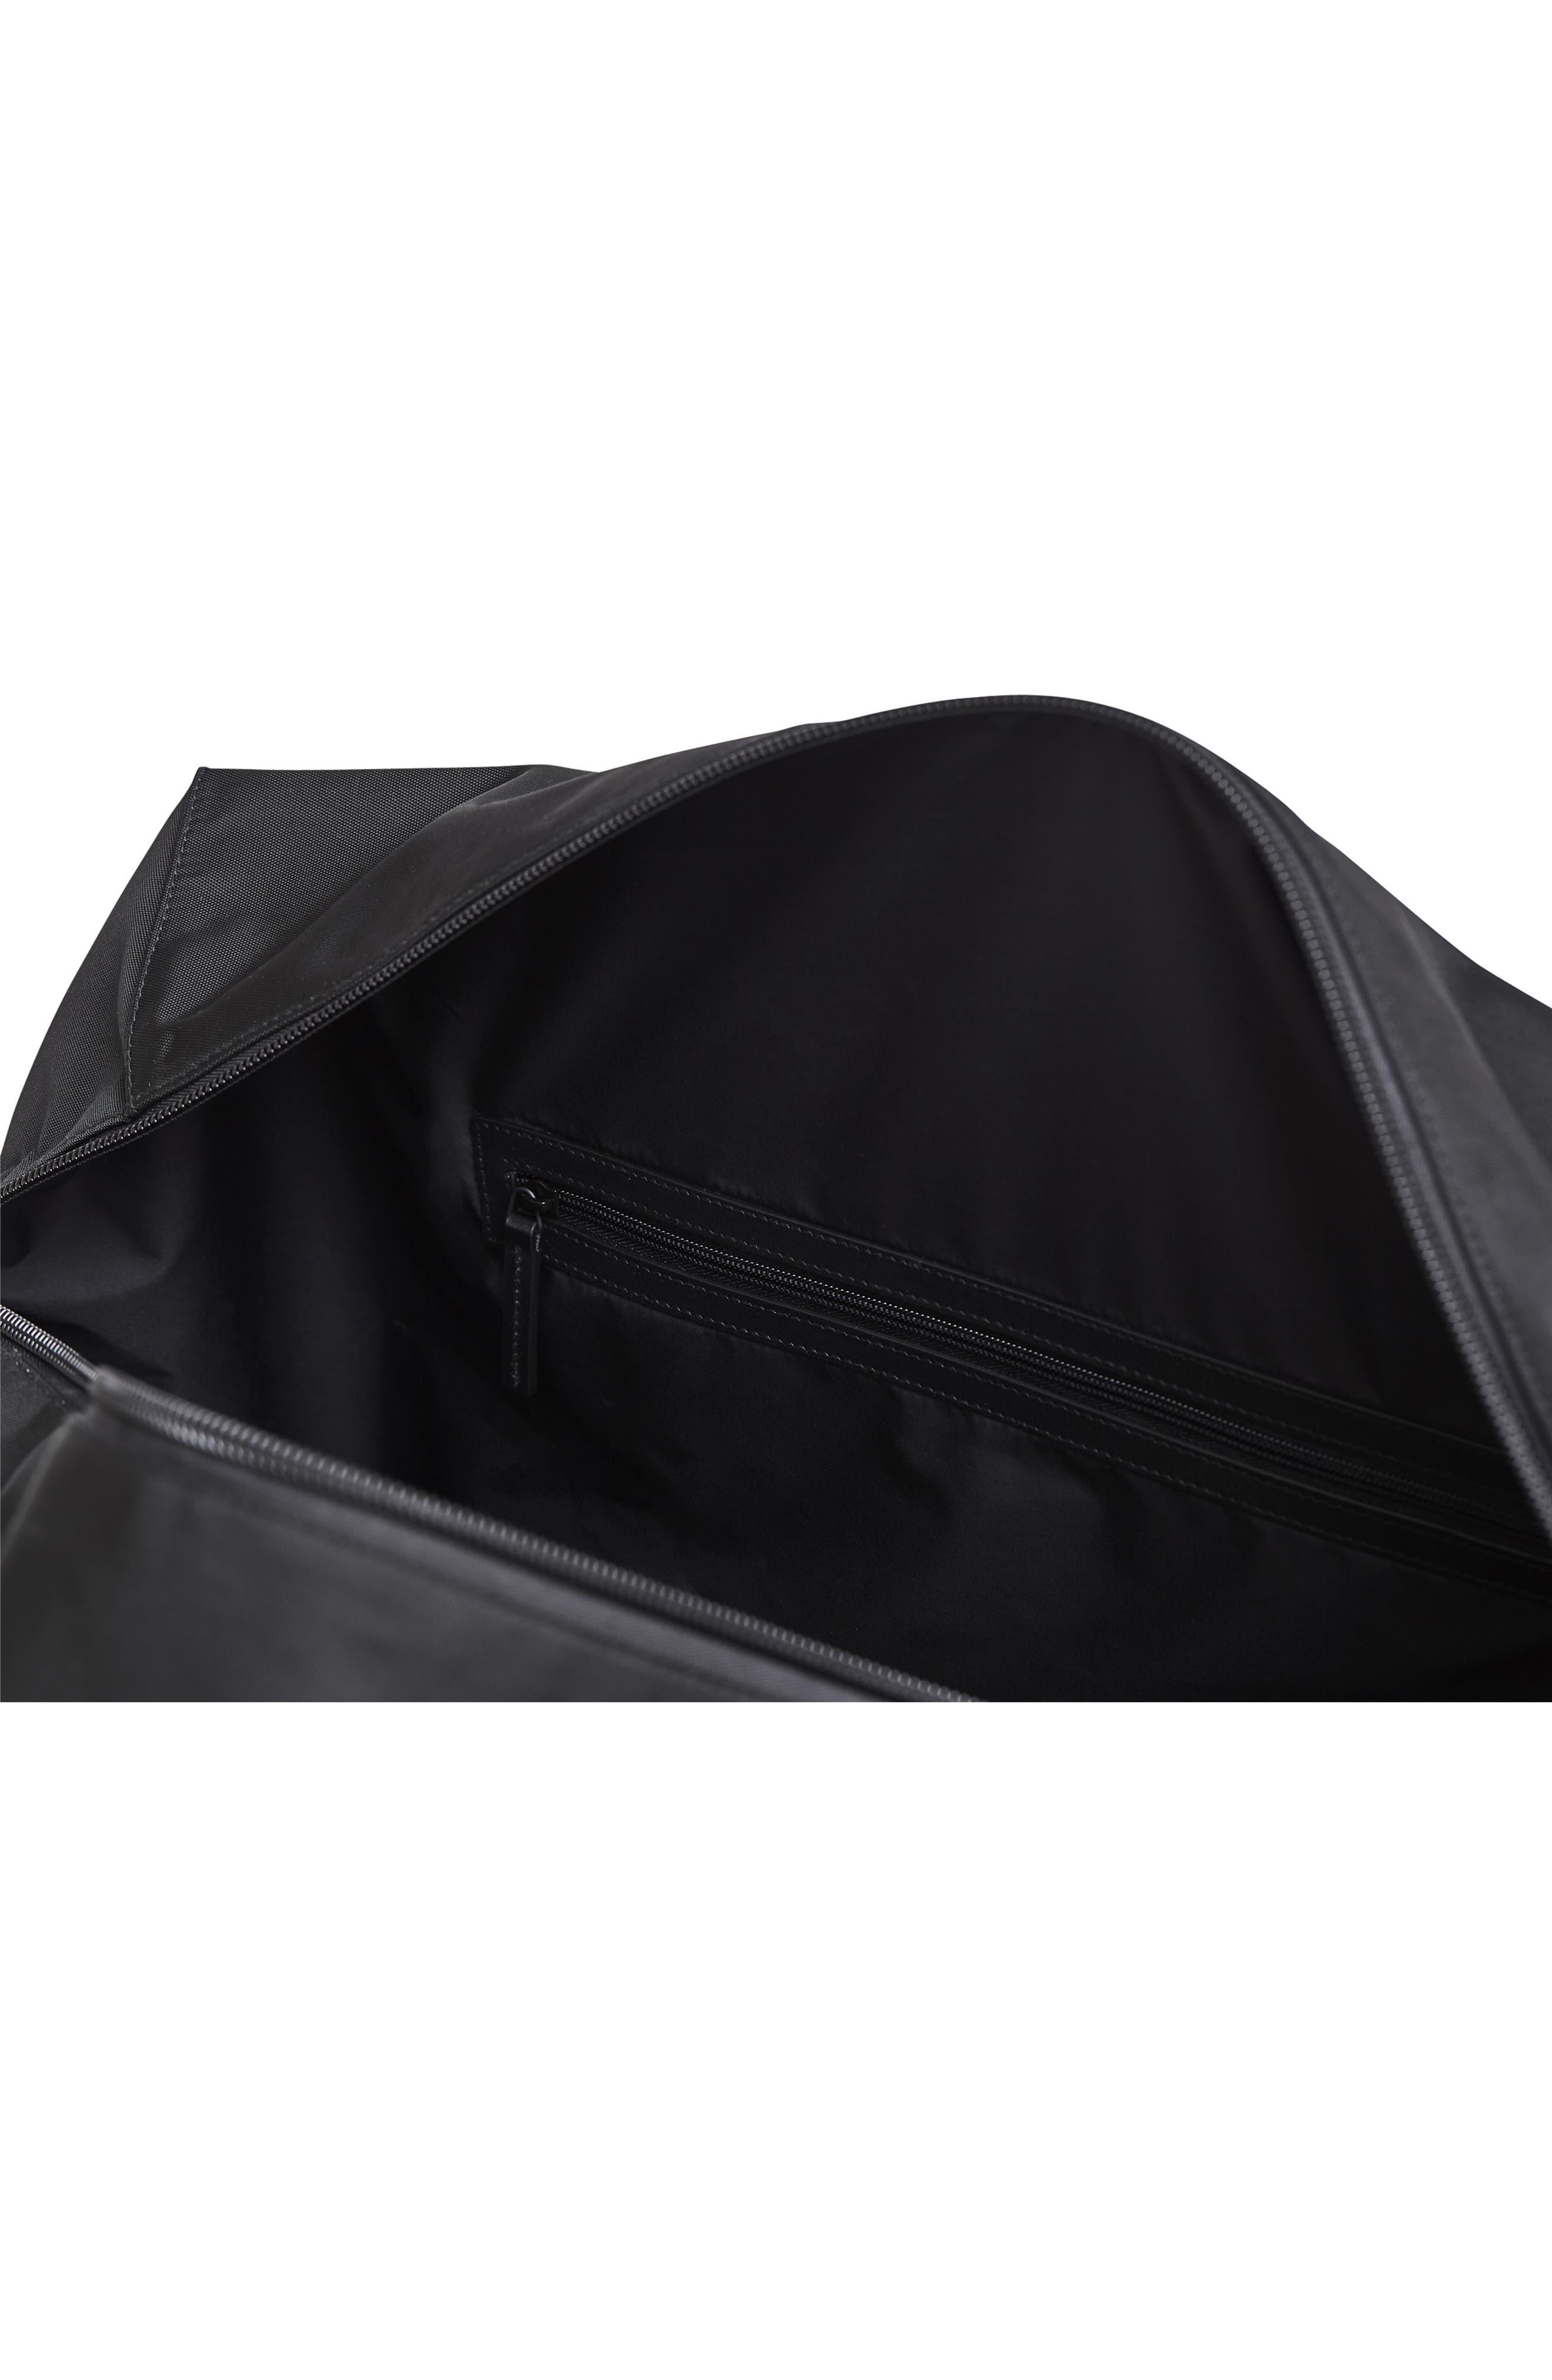 Lightweight Duffel Bag,                             Alternate thumbnail 6, color,                             Black Nylon/ Black Leather